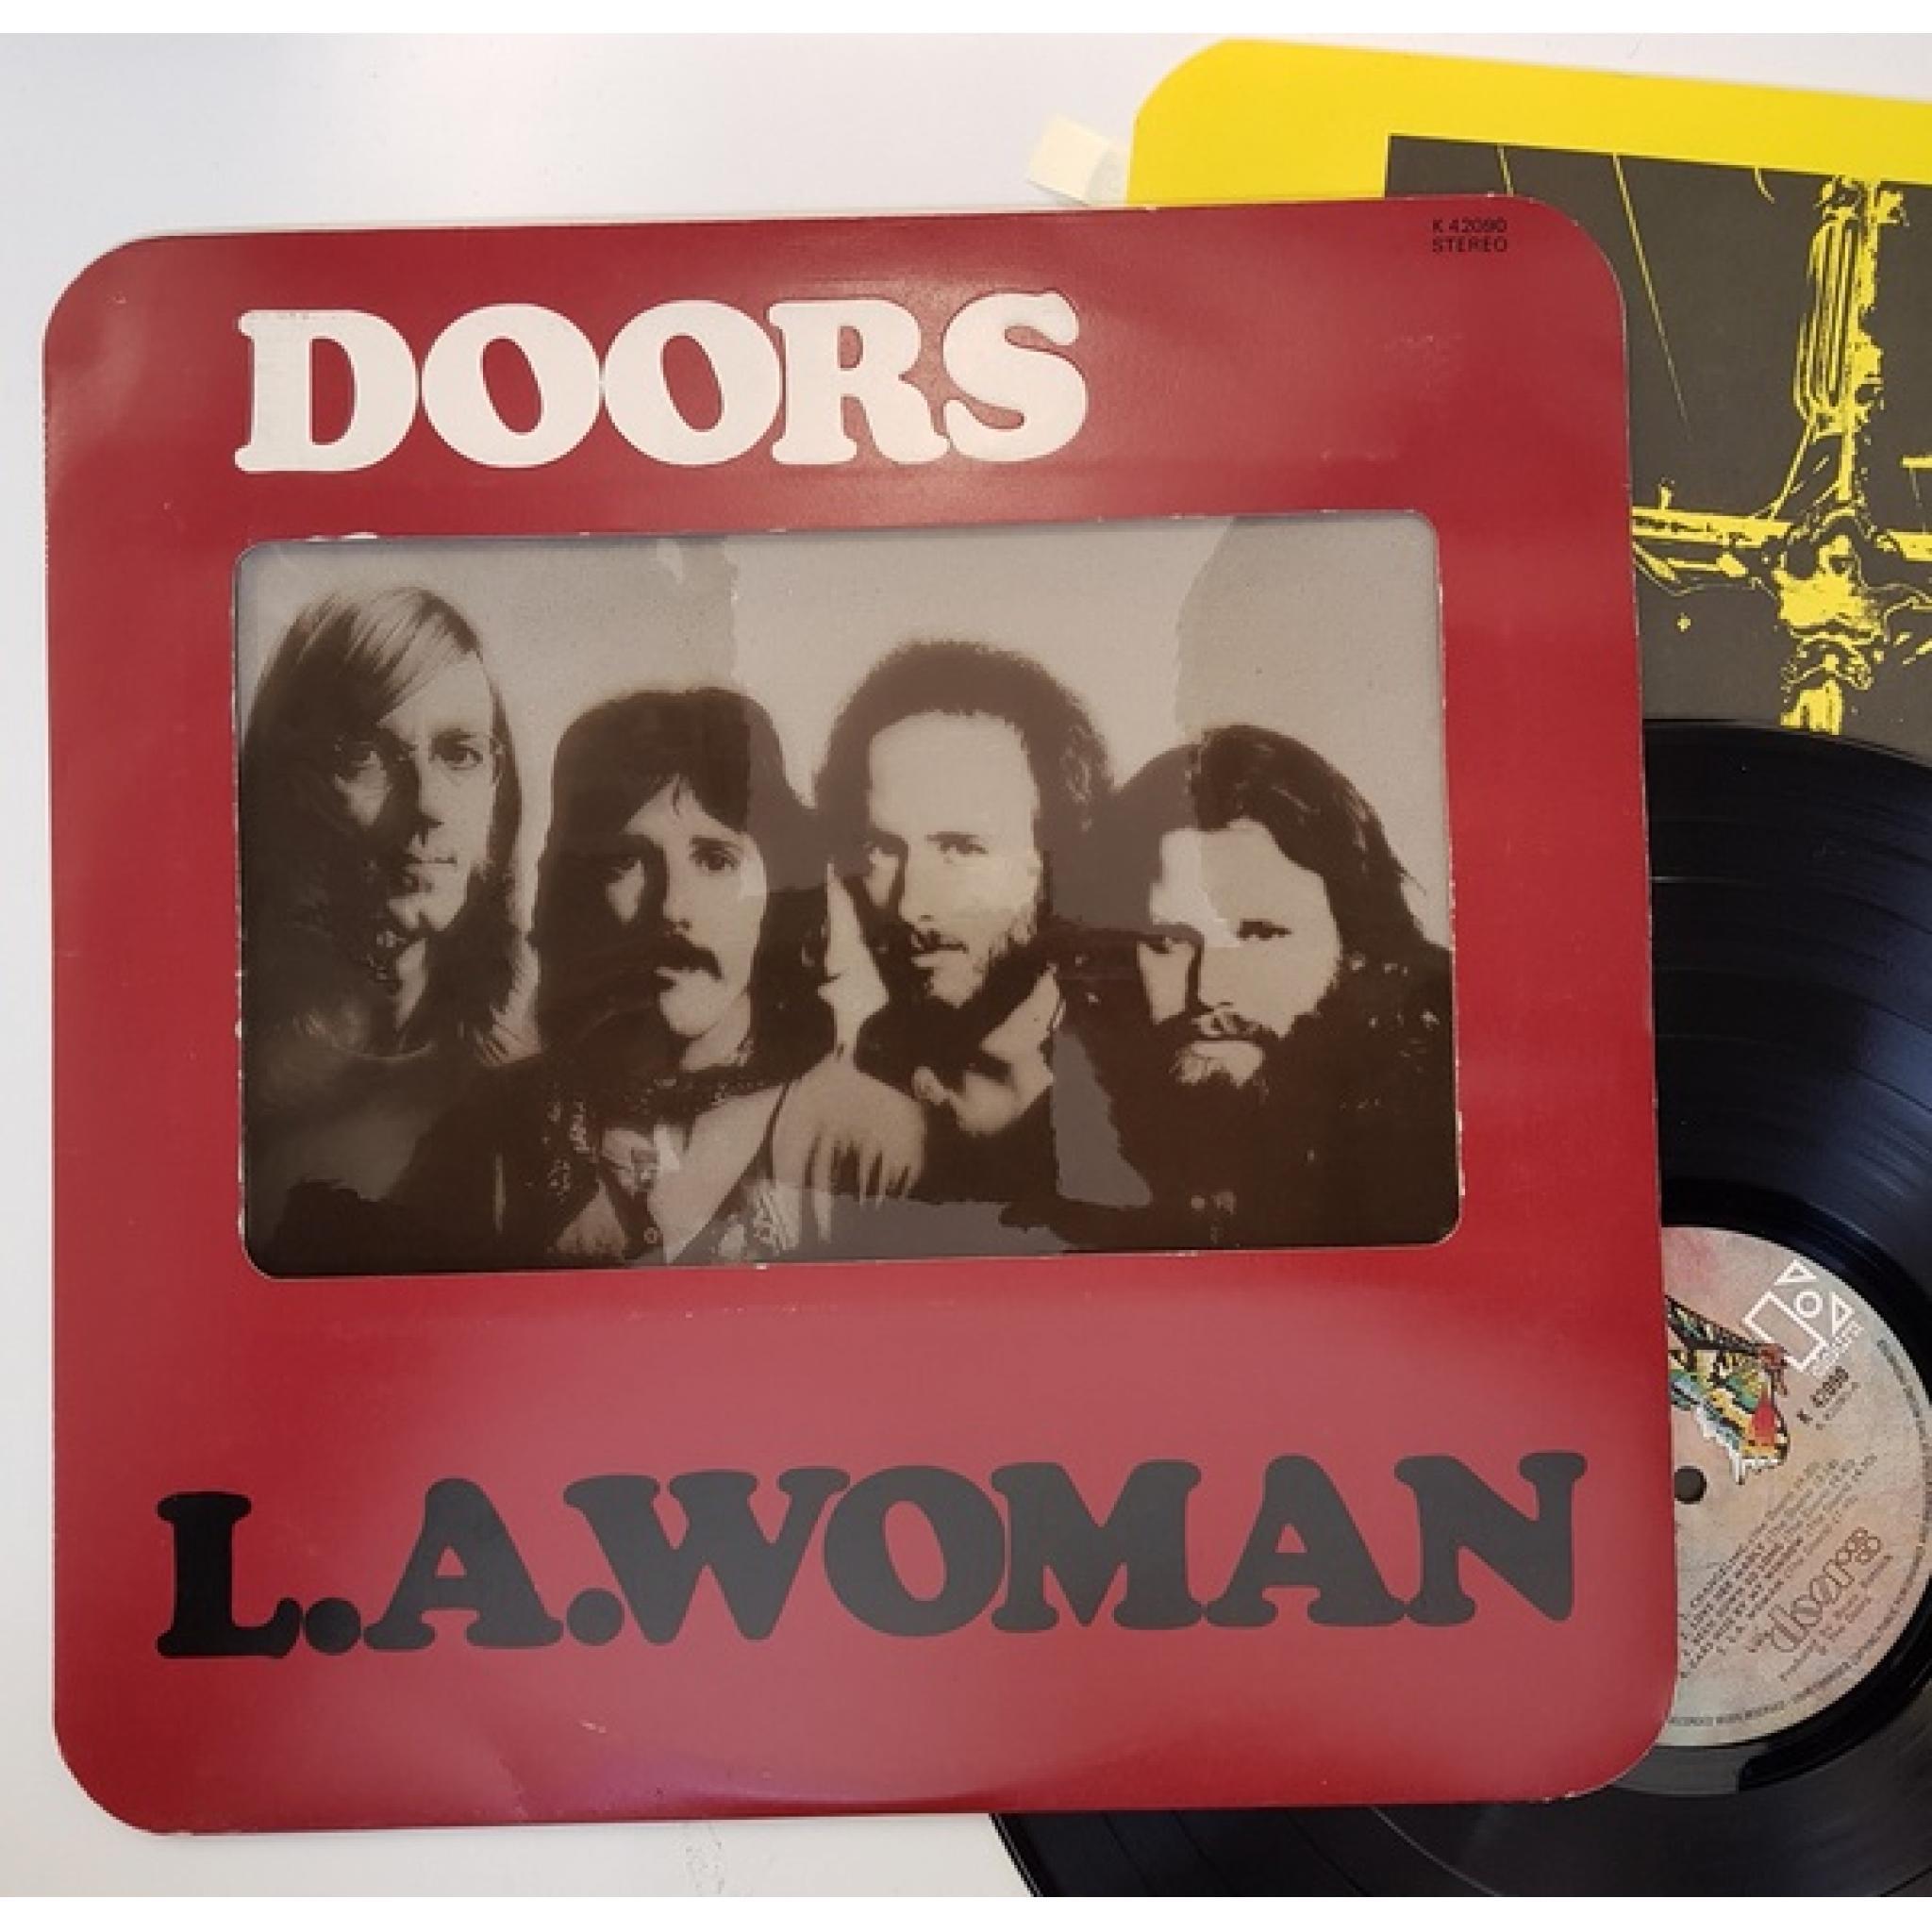 THE DOORS L A Woman INCLUDING CROSS INNER EKS 75011